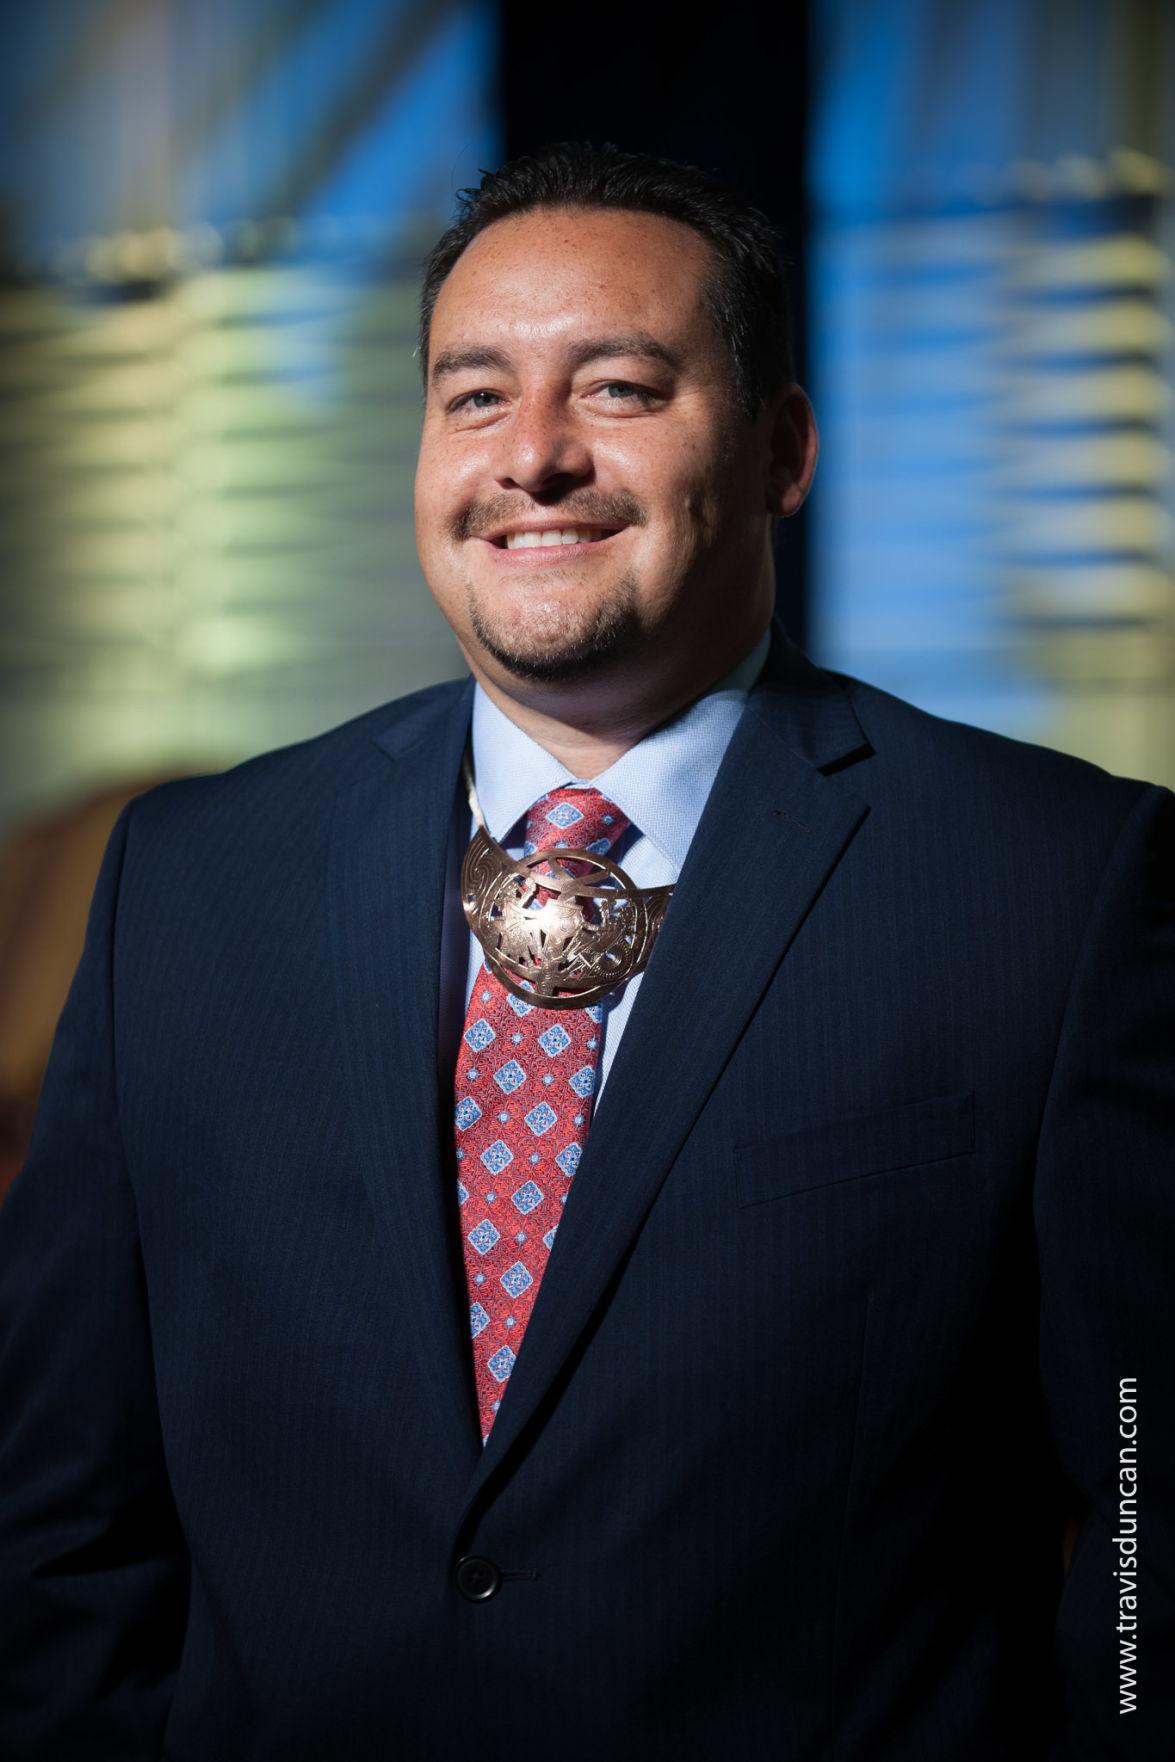 Matthew L. Morgan, Esq., chairman